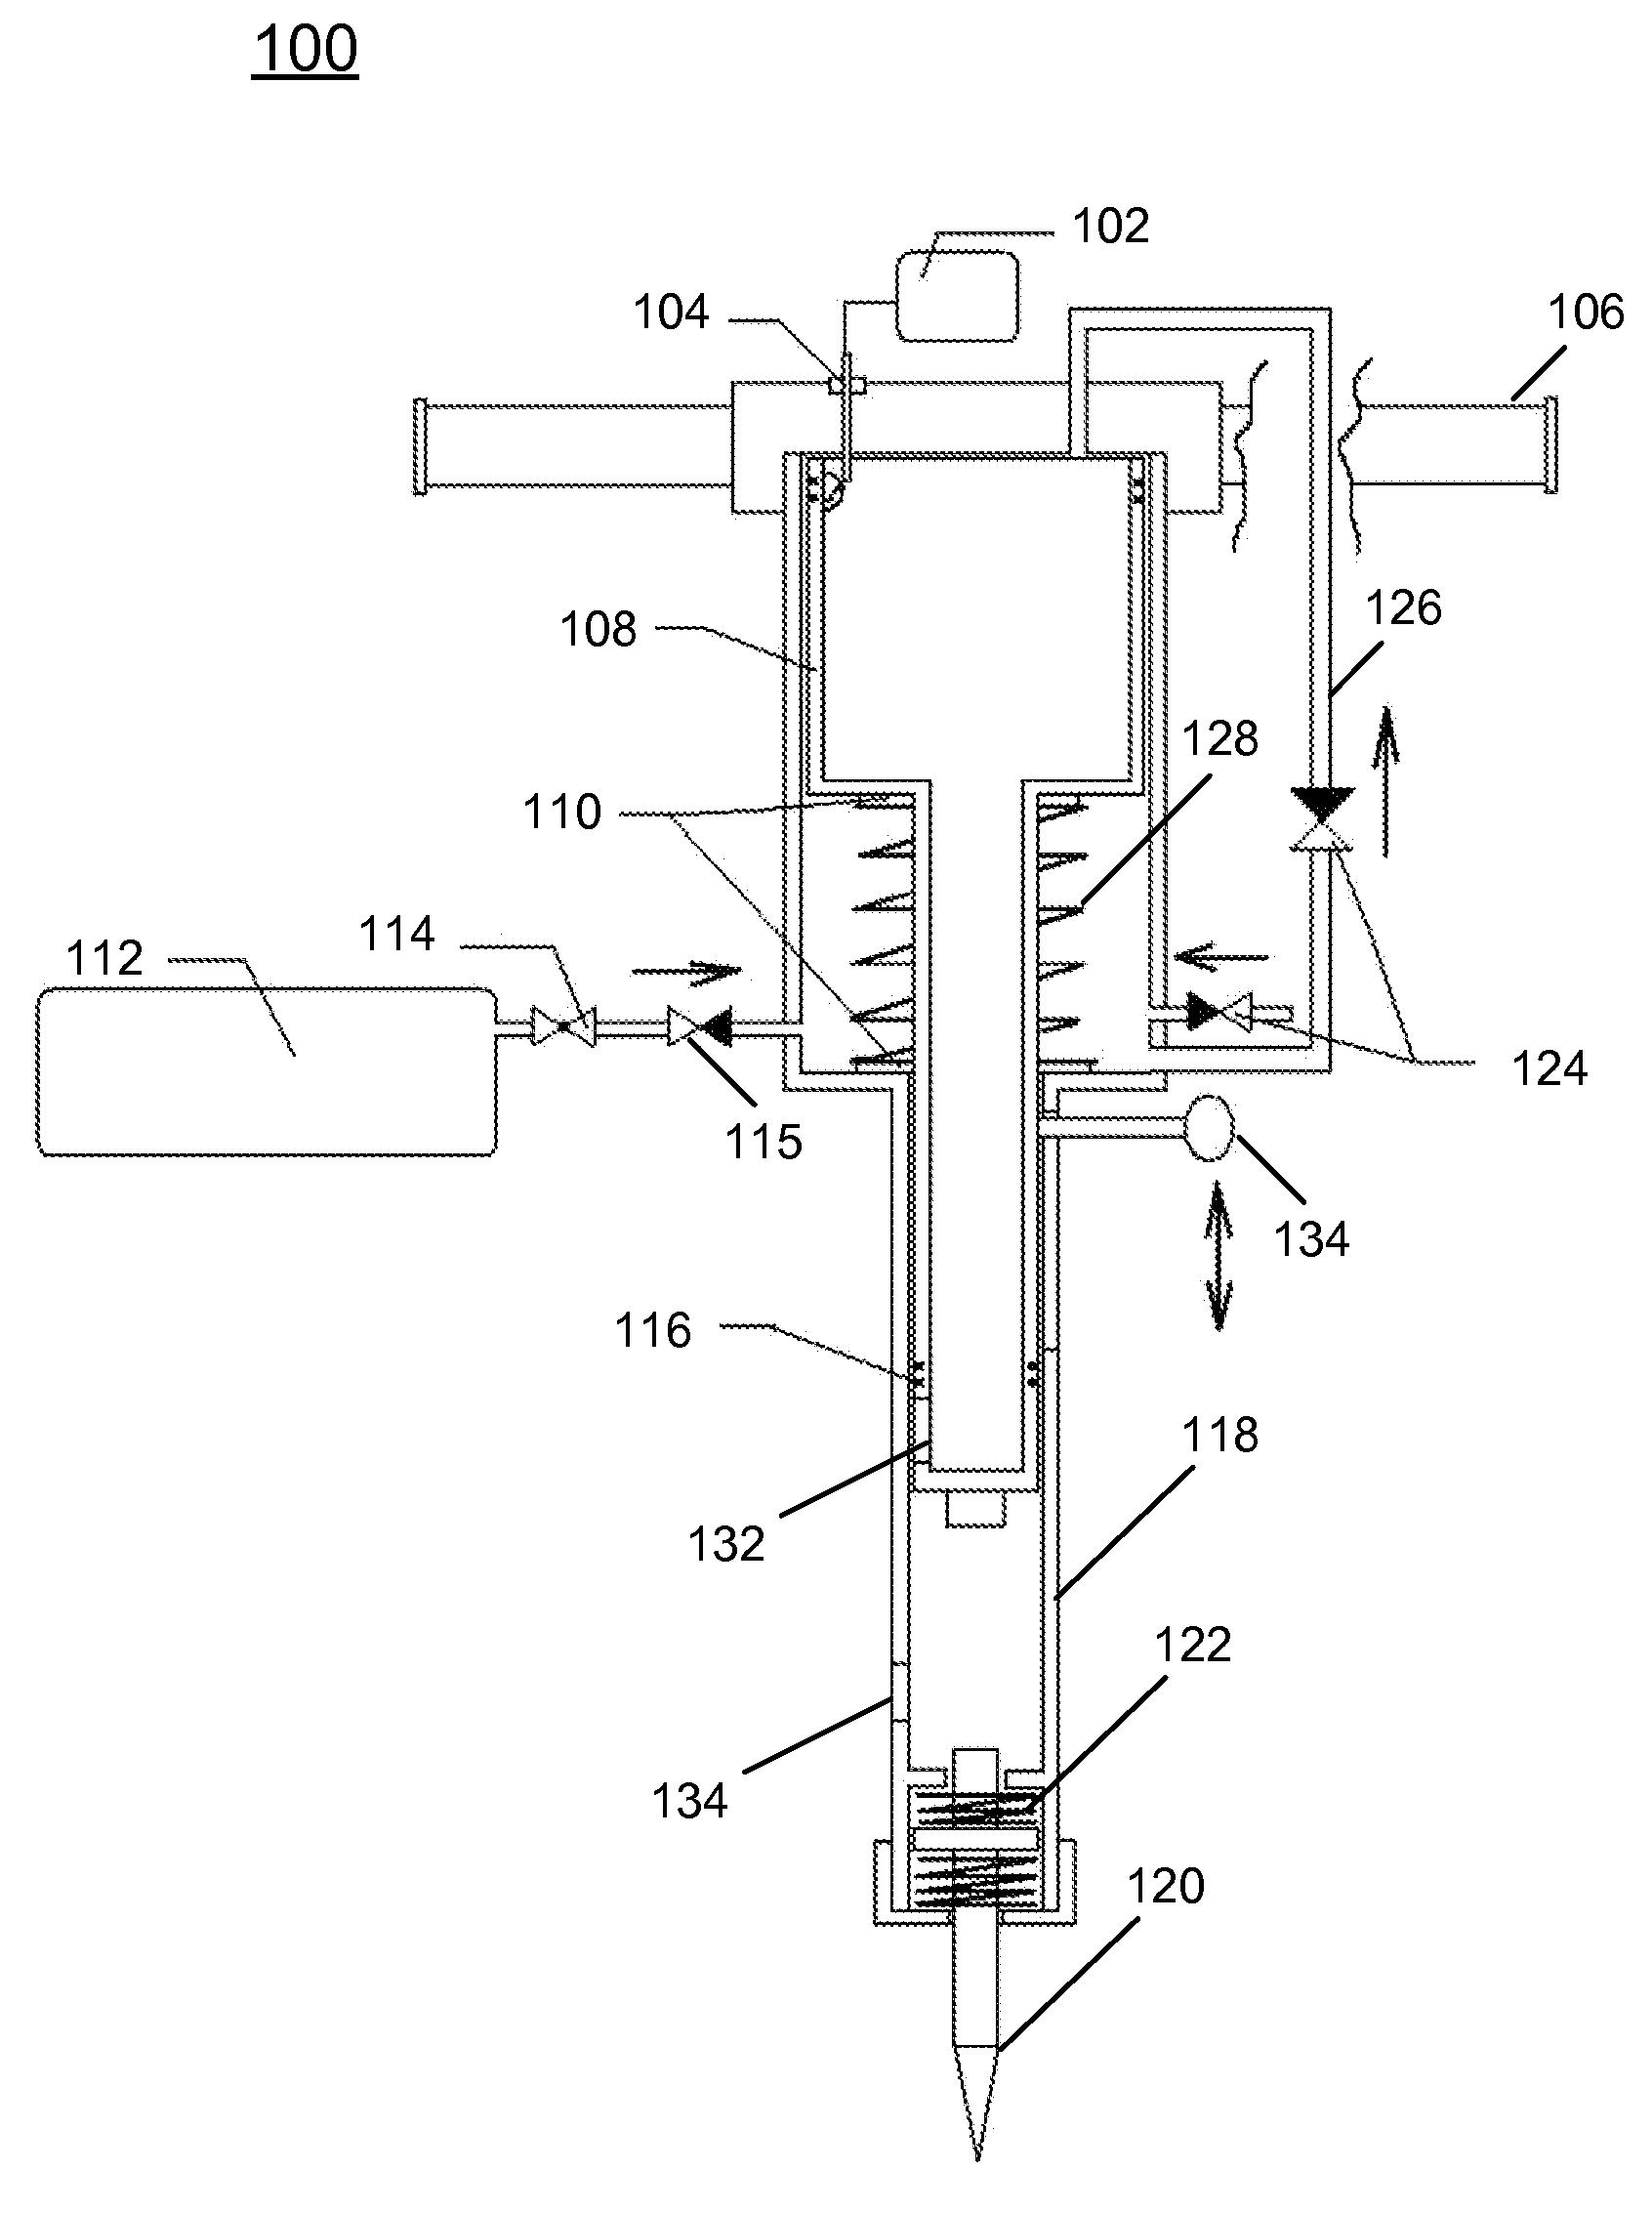 patent us20130255985 - portable jackhammer